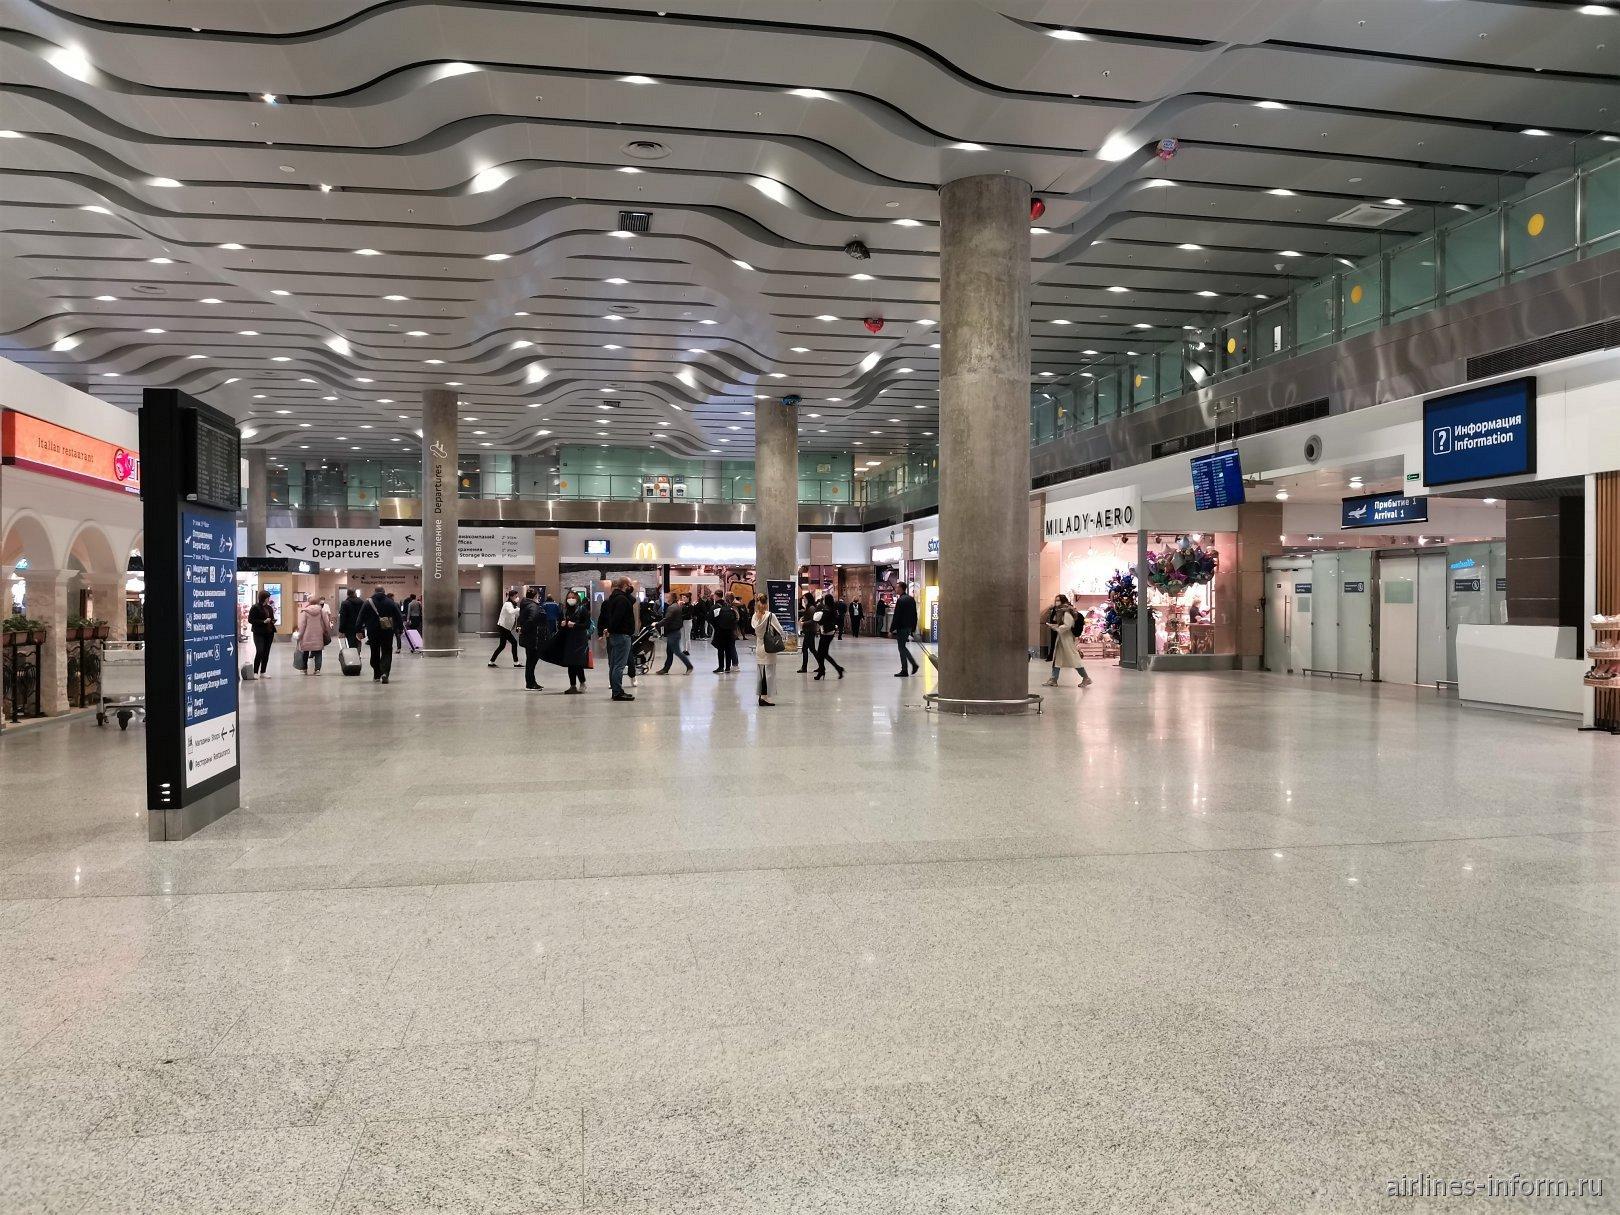 Зал прилета в аэропорту Пулково